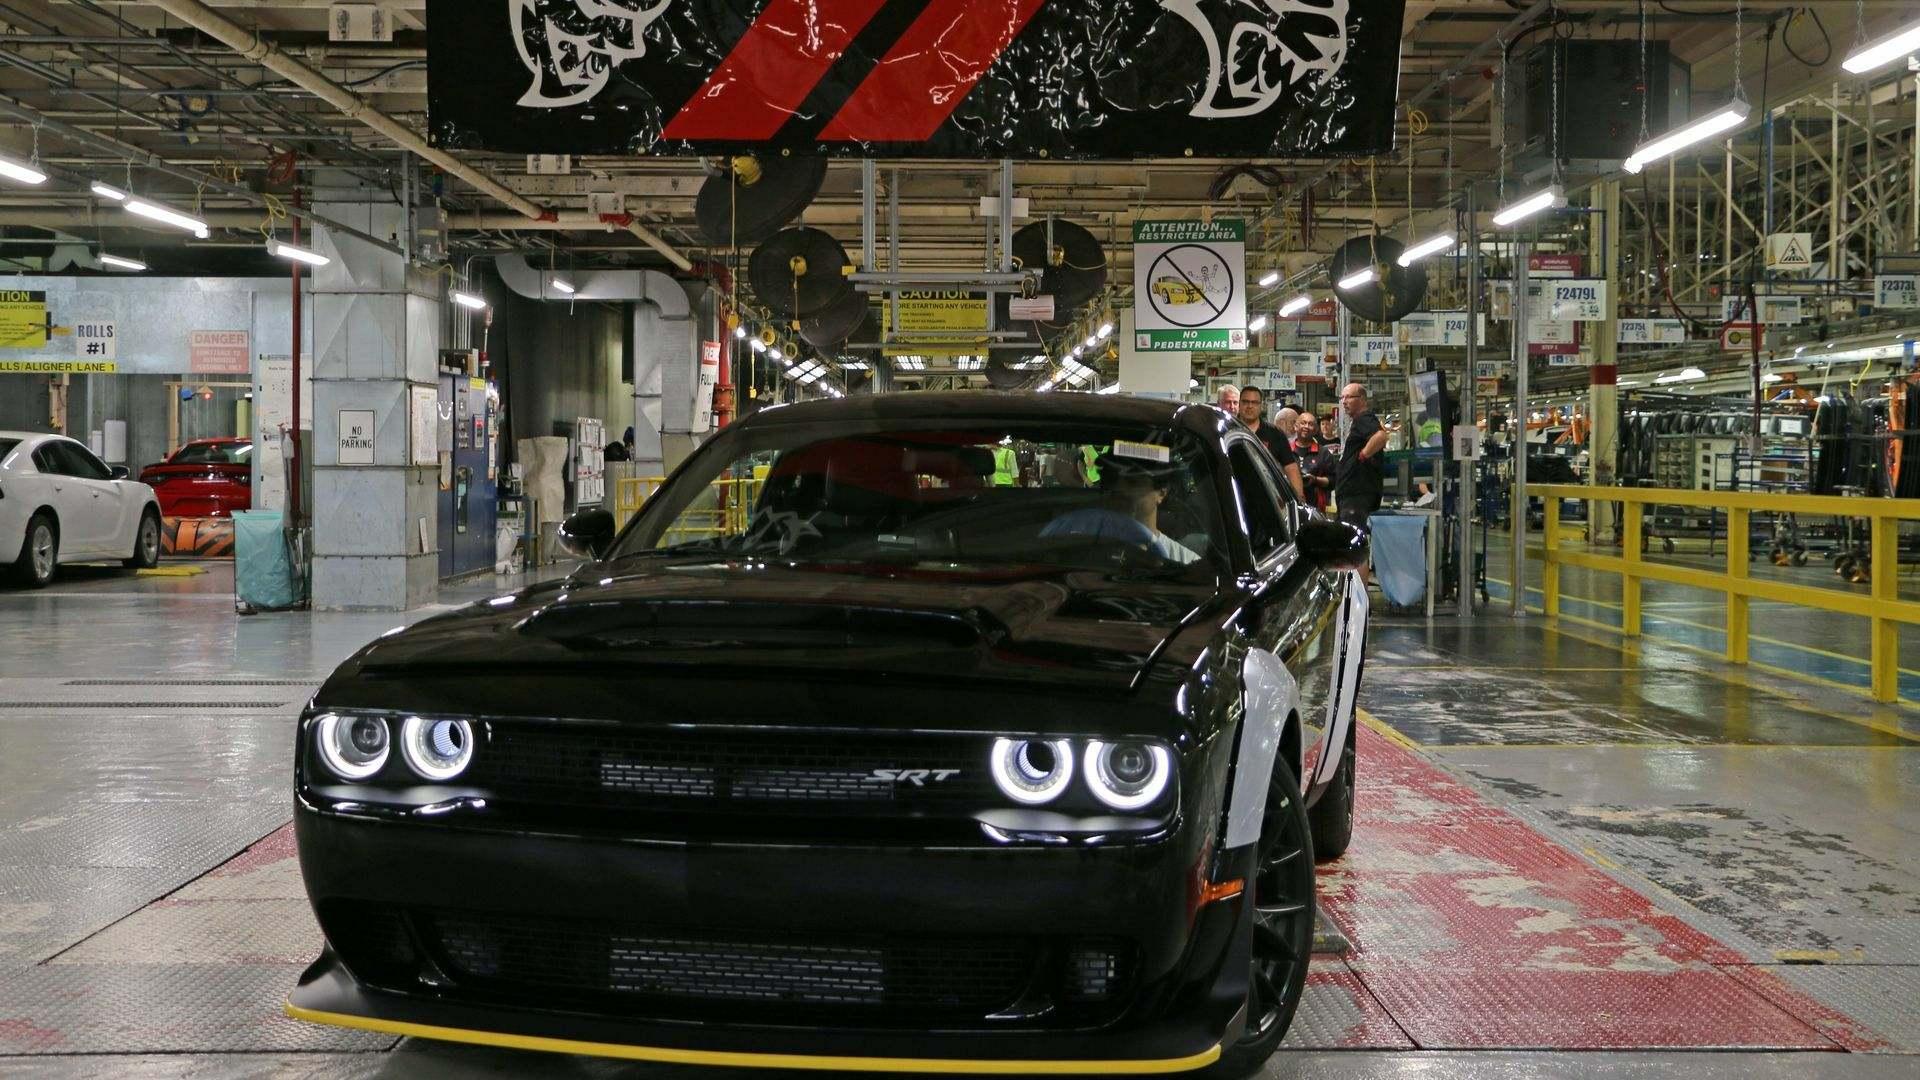 ¿Cómo se fabrica un automóvil de serie limitada? (XII)